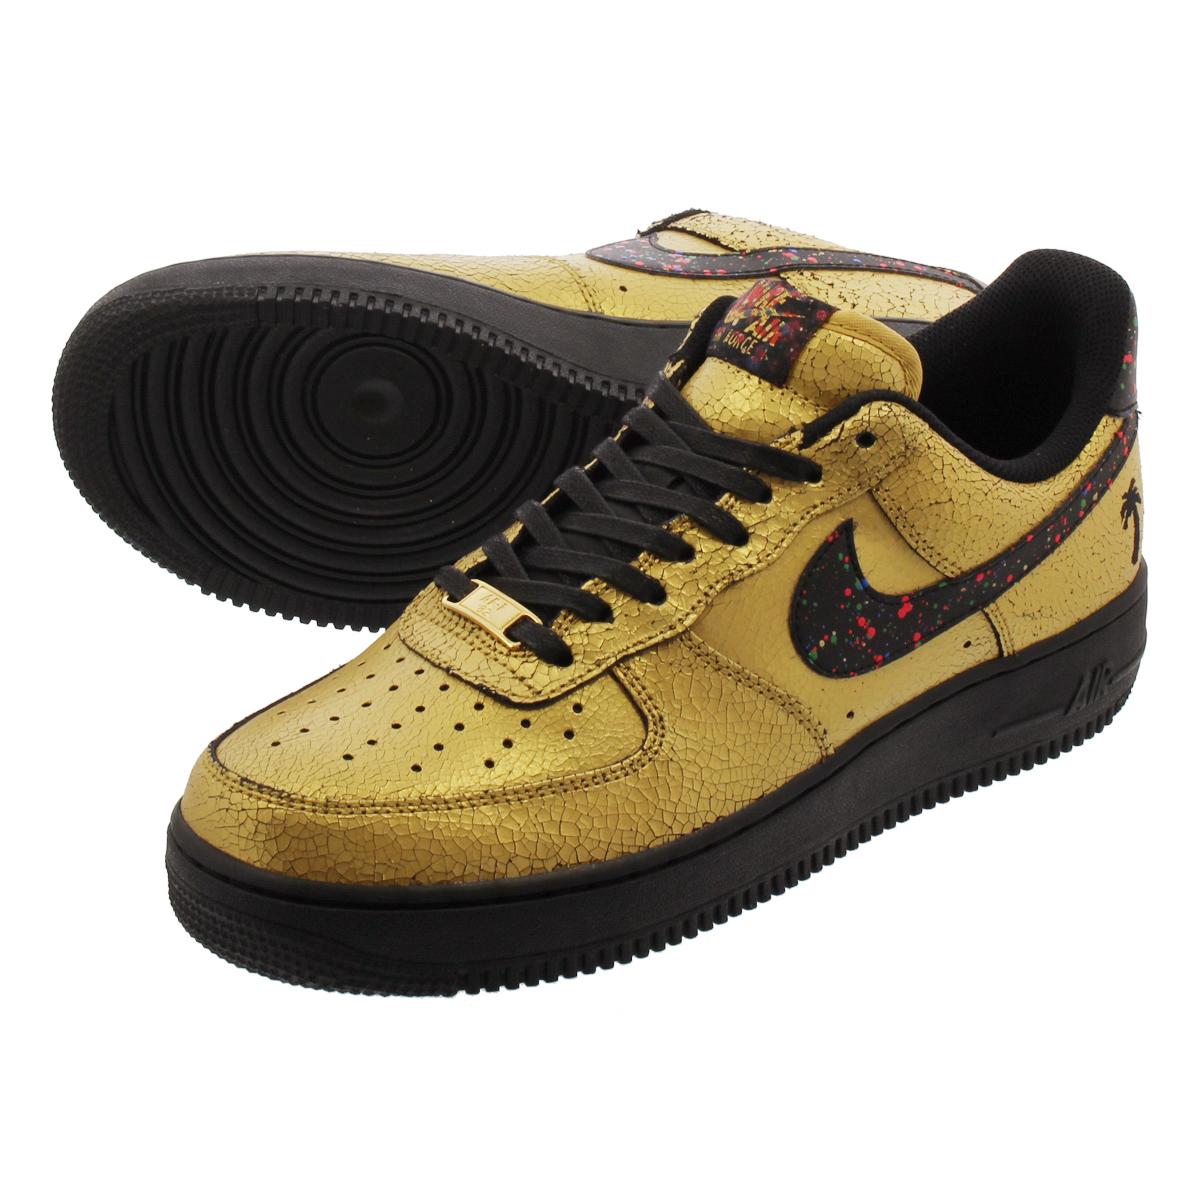 Goldblack Av3219 Force Air Metallic 700 Nike '07 1 zpGSUVLqM